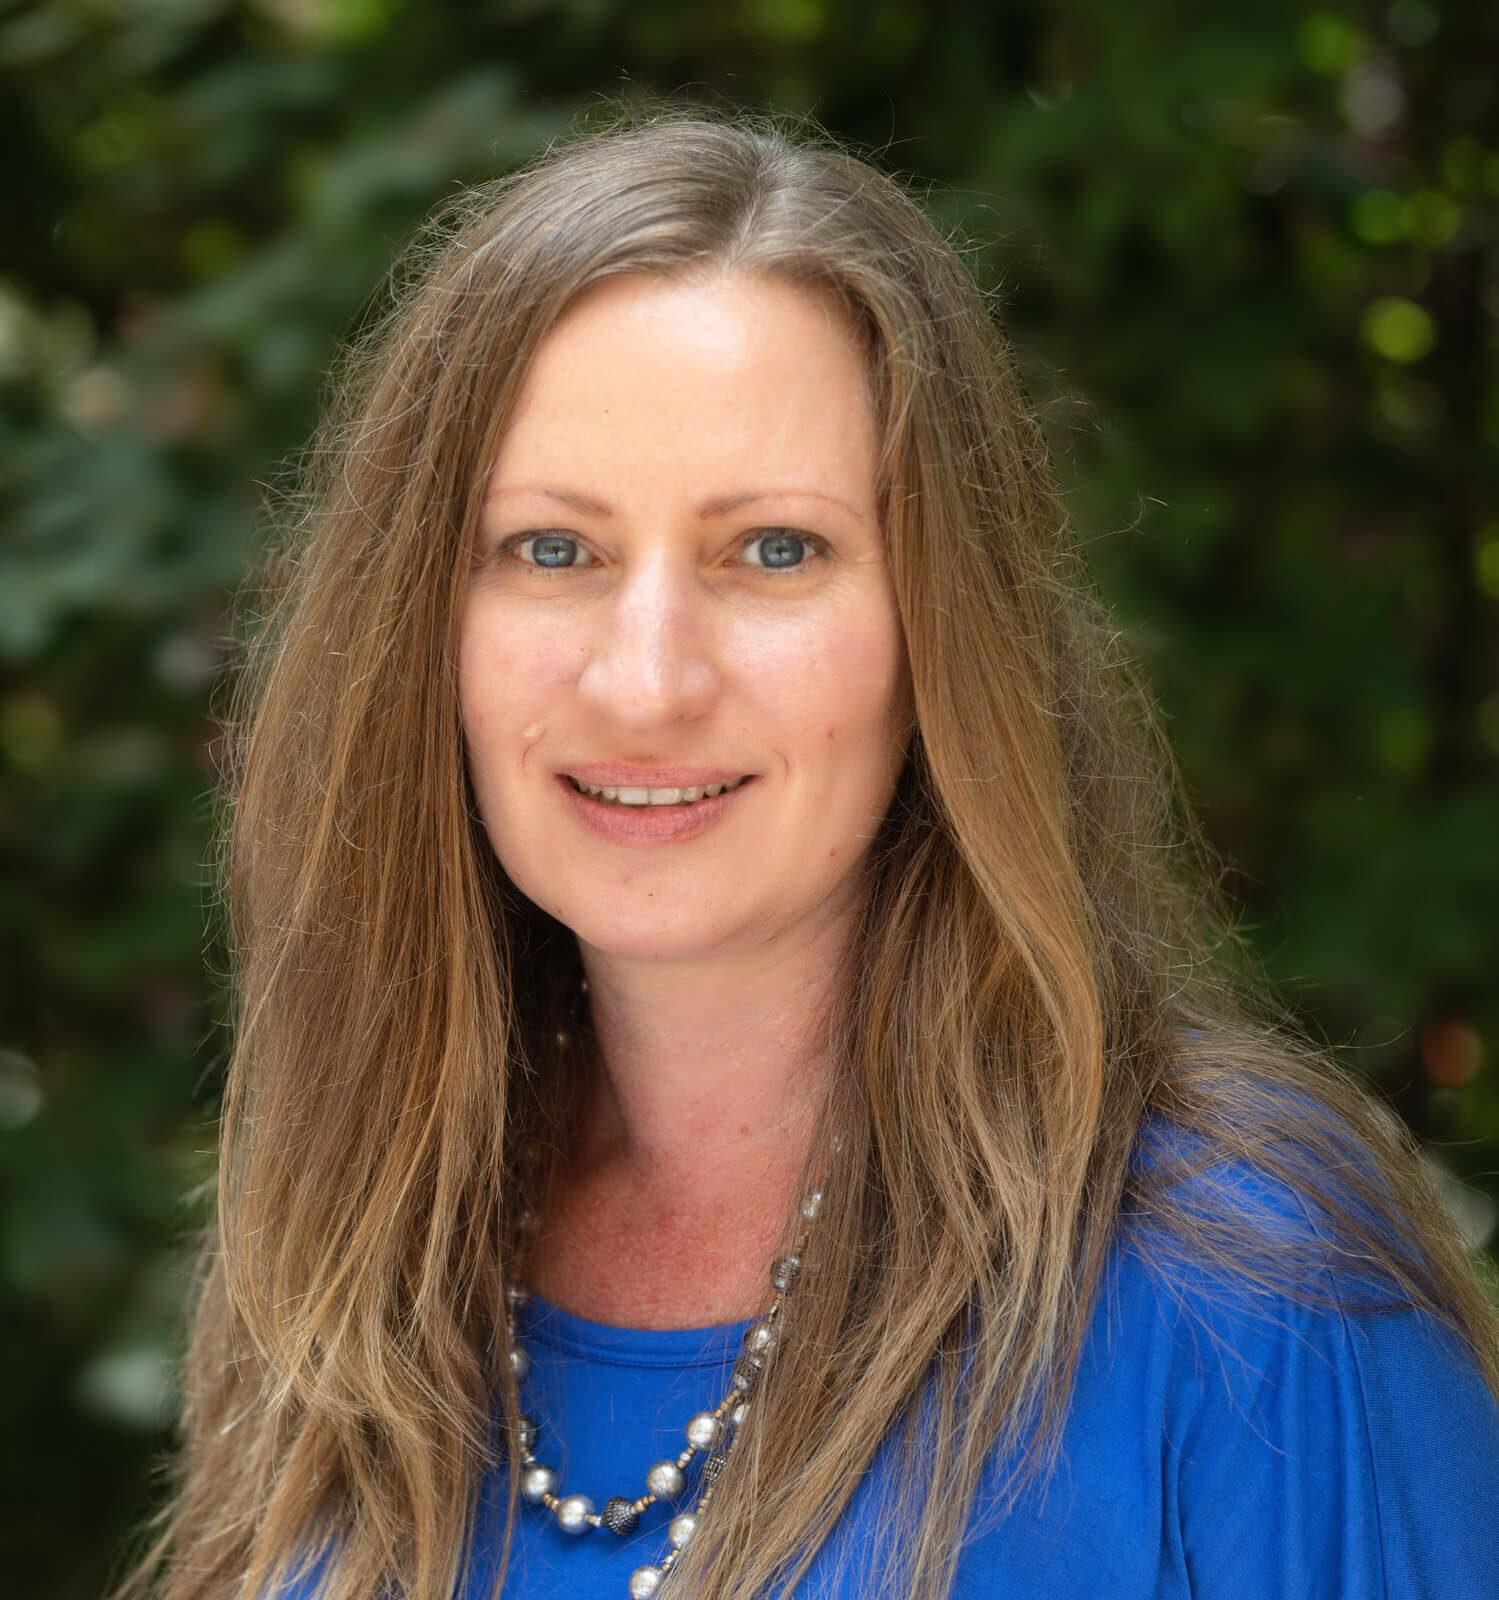 Ingrid Sander, staff member at Mountain BizWorks